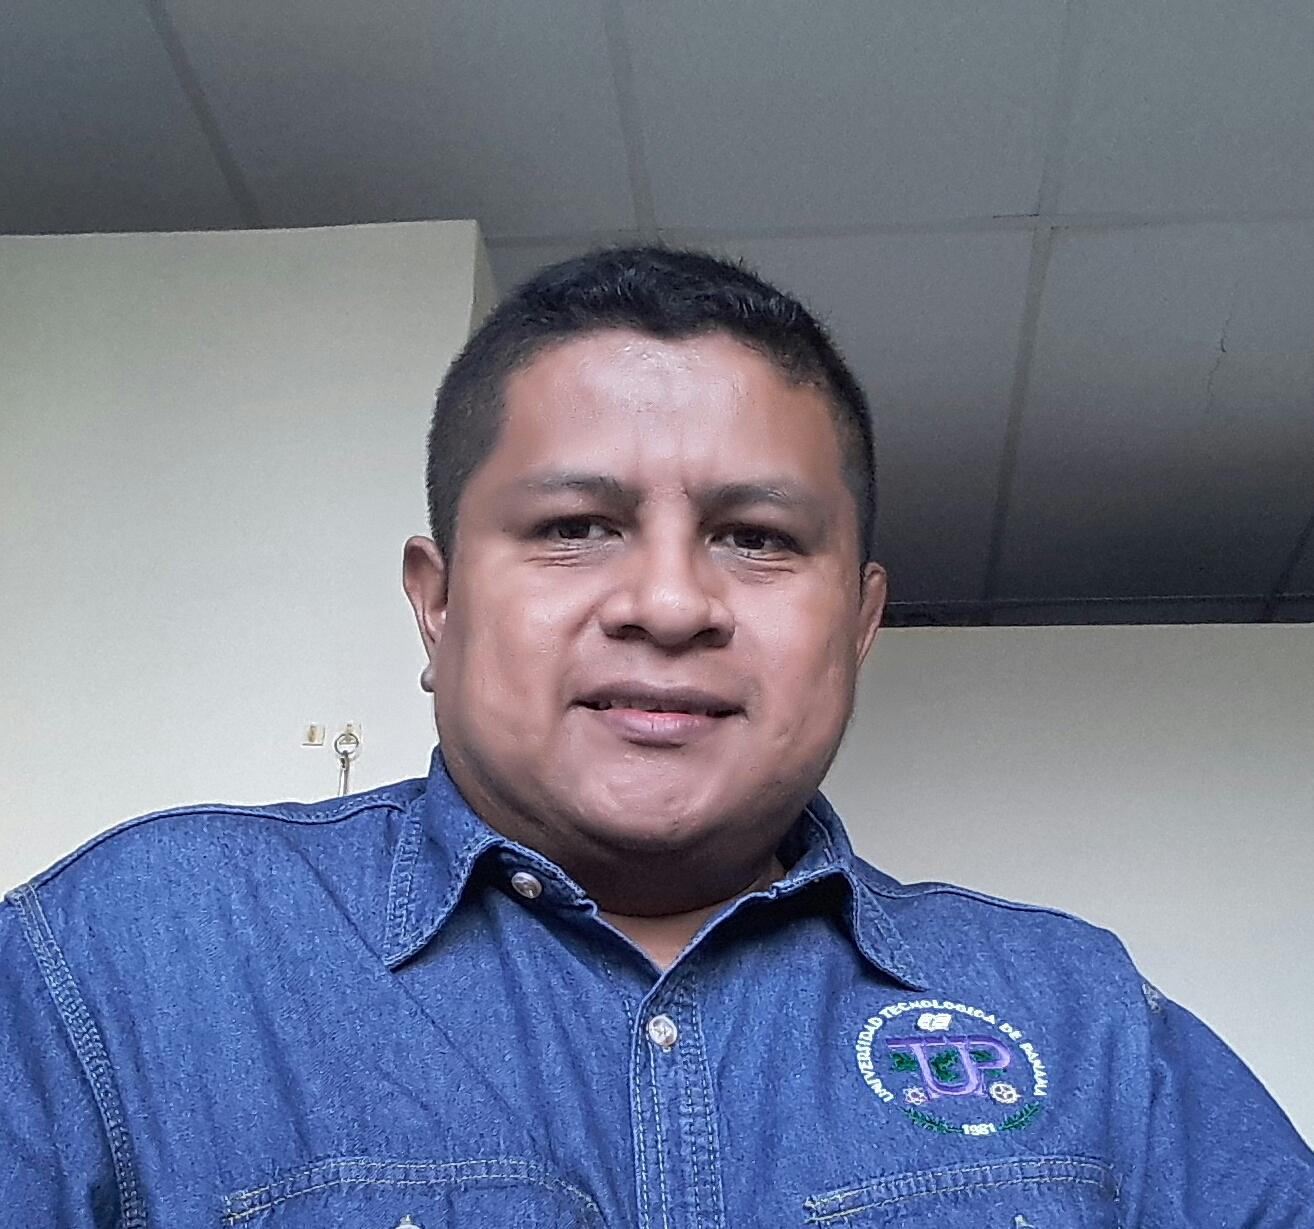 Idulfo Humberto Arrocha Rodríguez